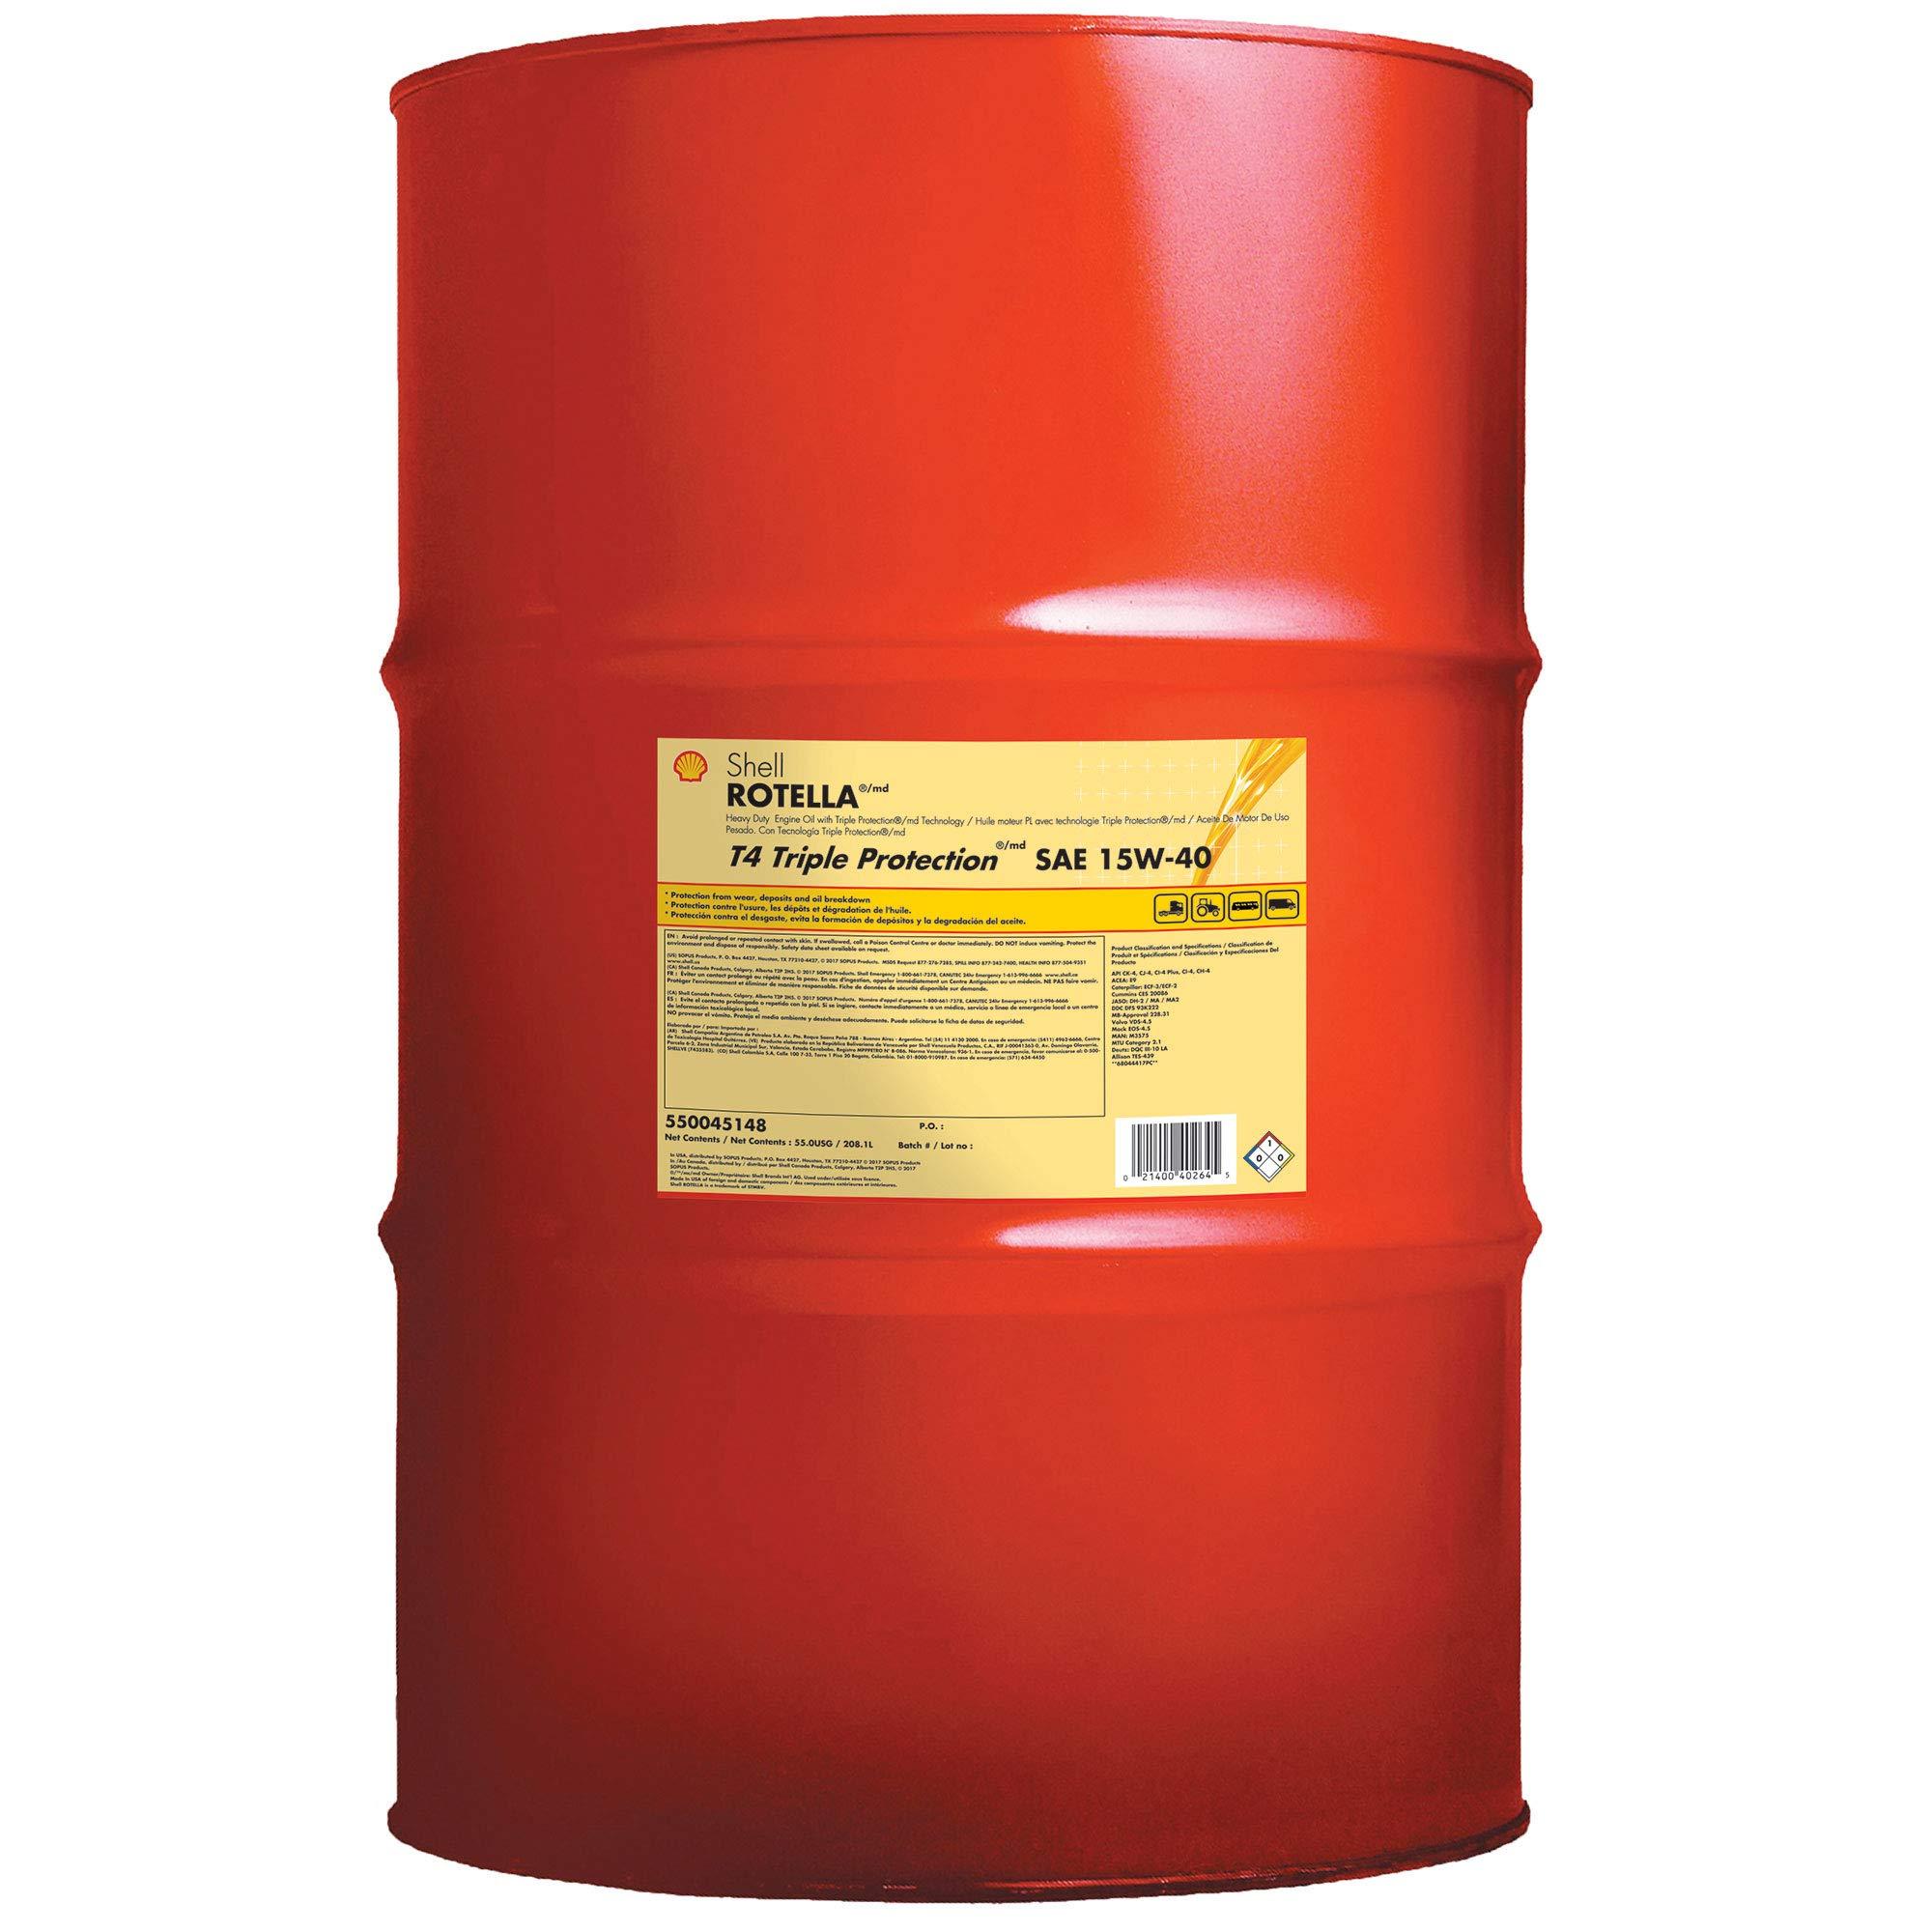 ROTELLA 550045148 T4 Drum Triple Protection Motor Diesel Oil (15W-40 CK-4), 55 Gallon